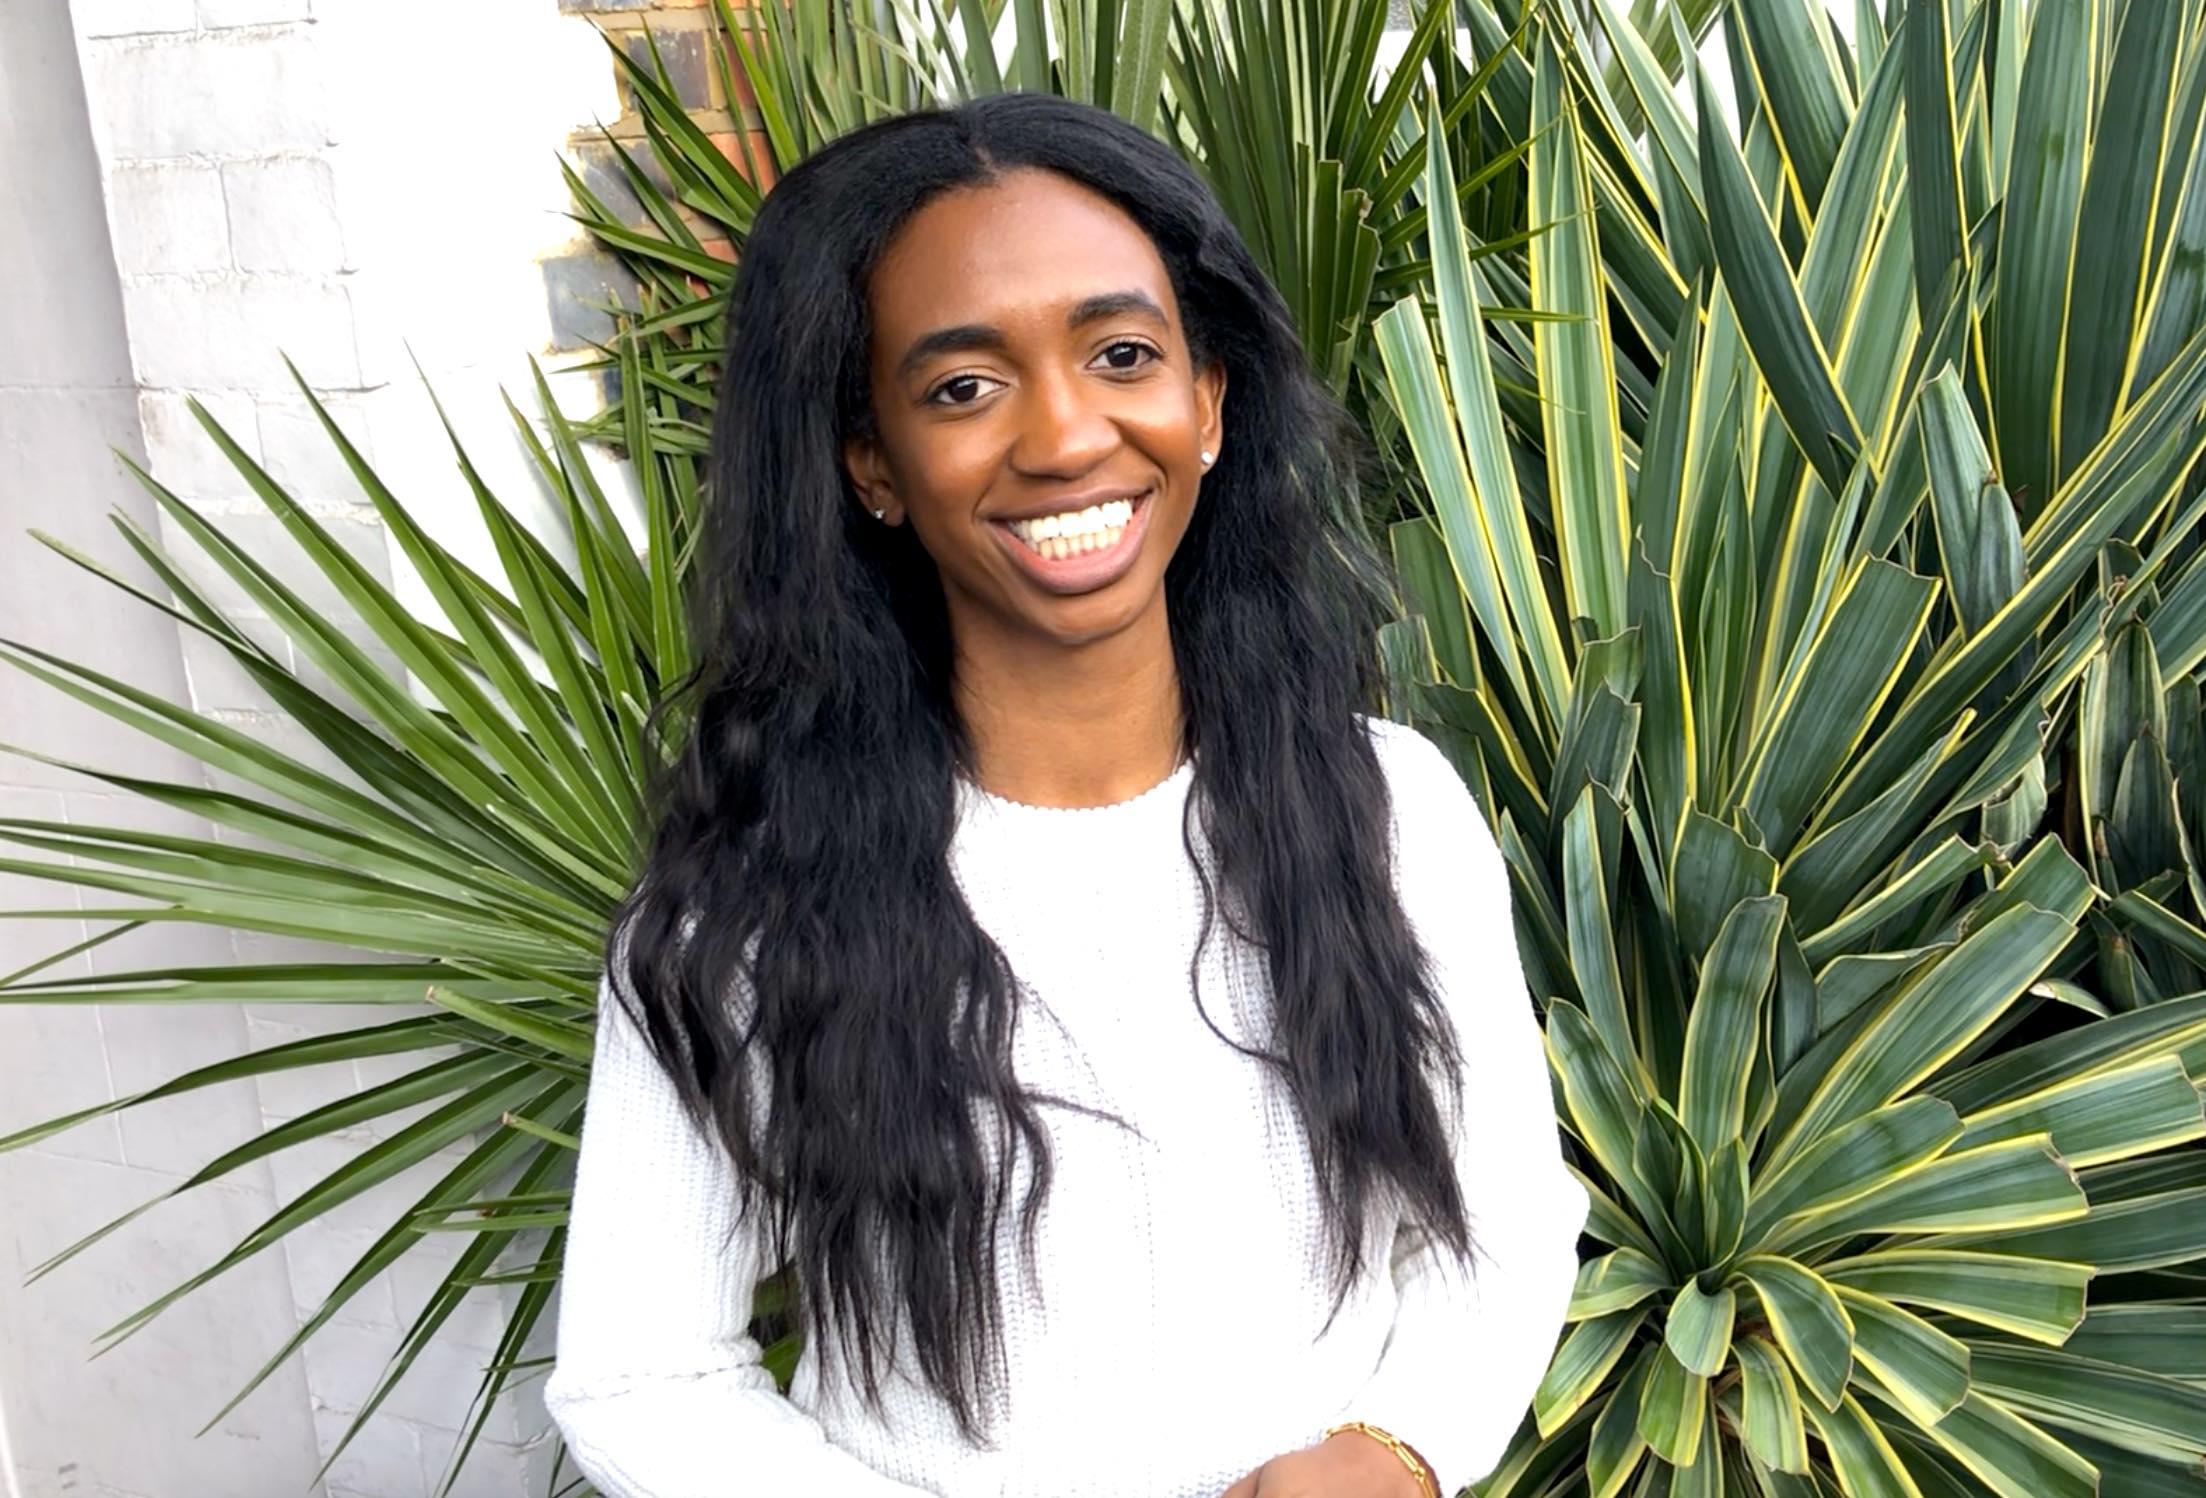 Nathifa Jordan CultureMix Arts Business Manager 2021